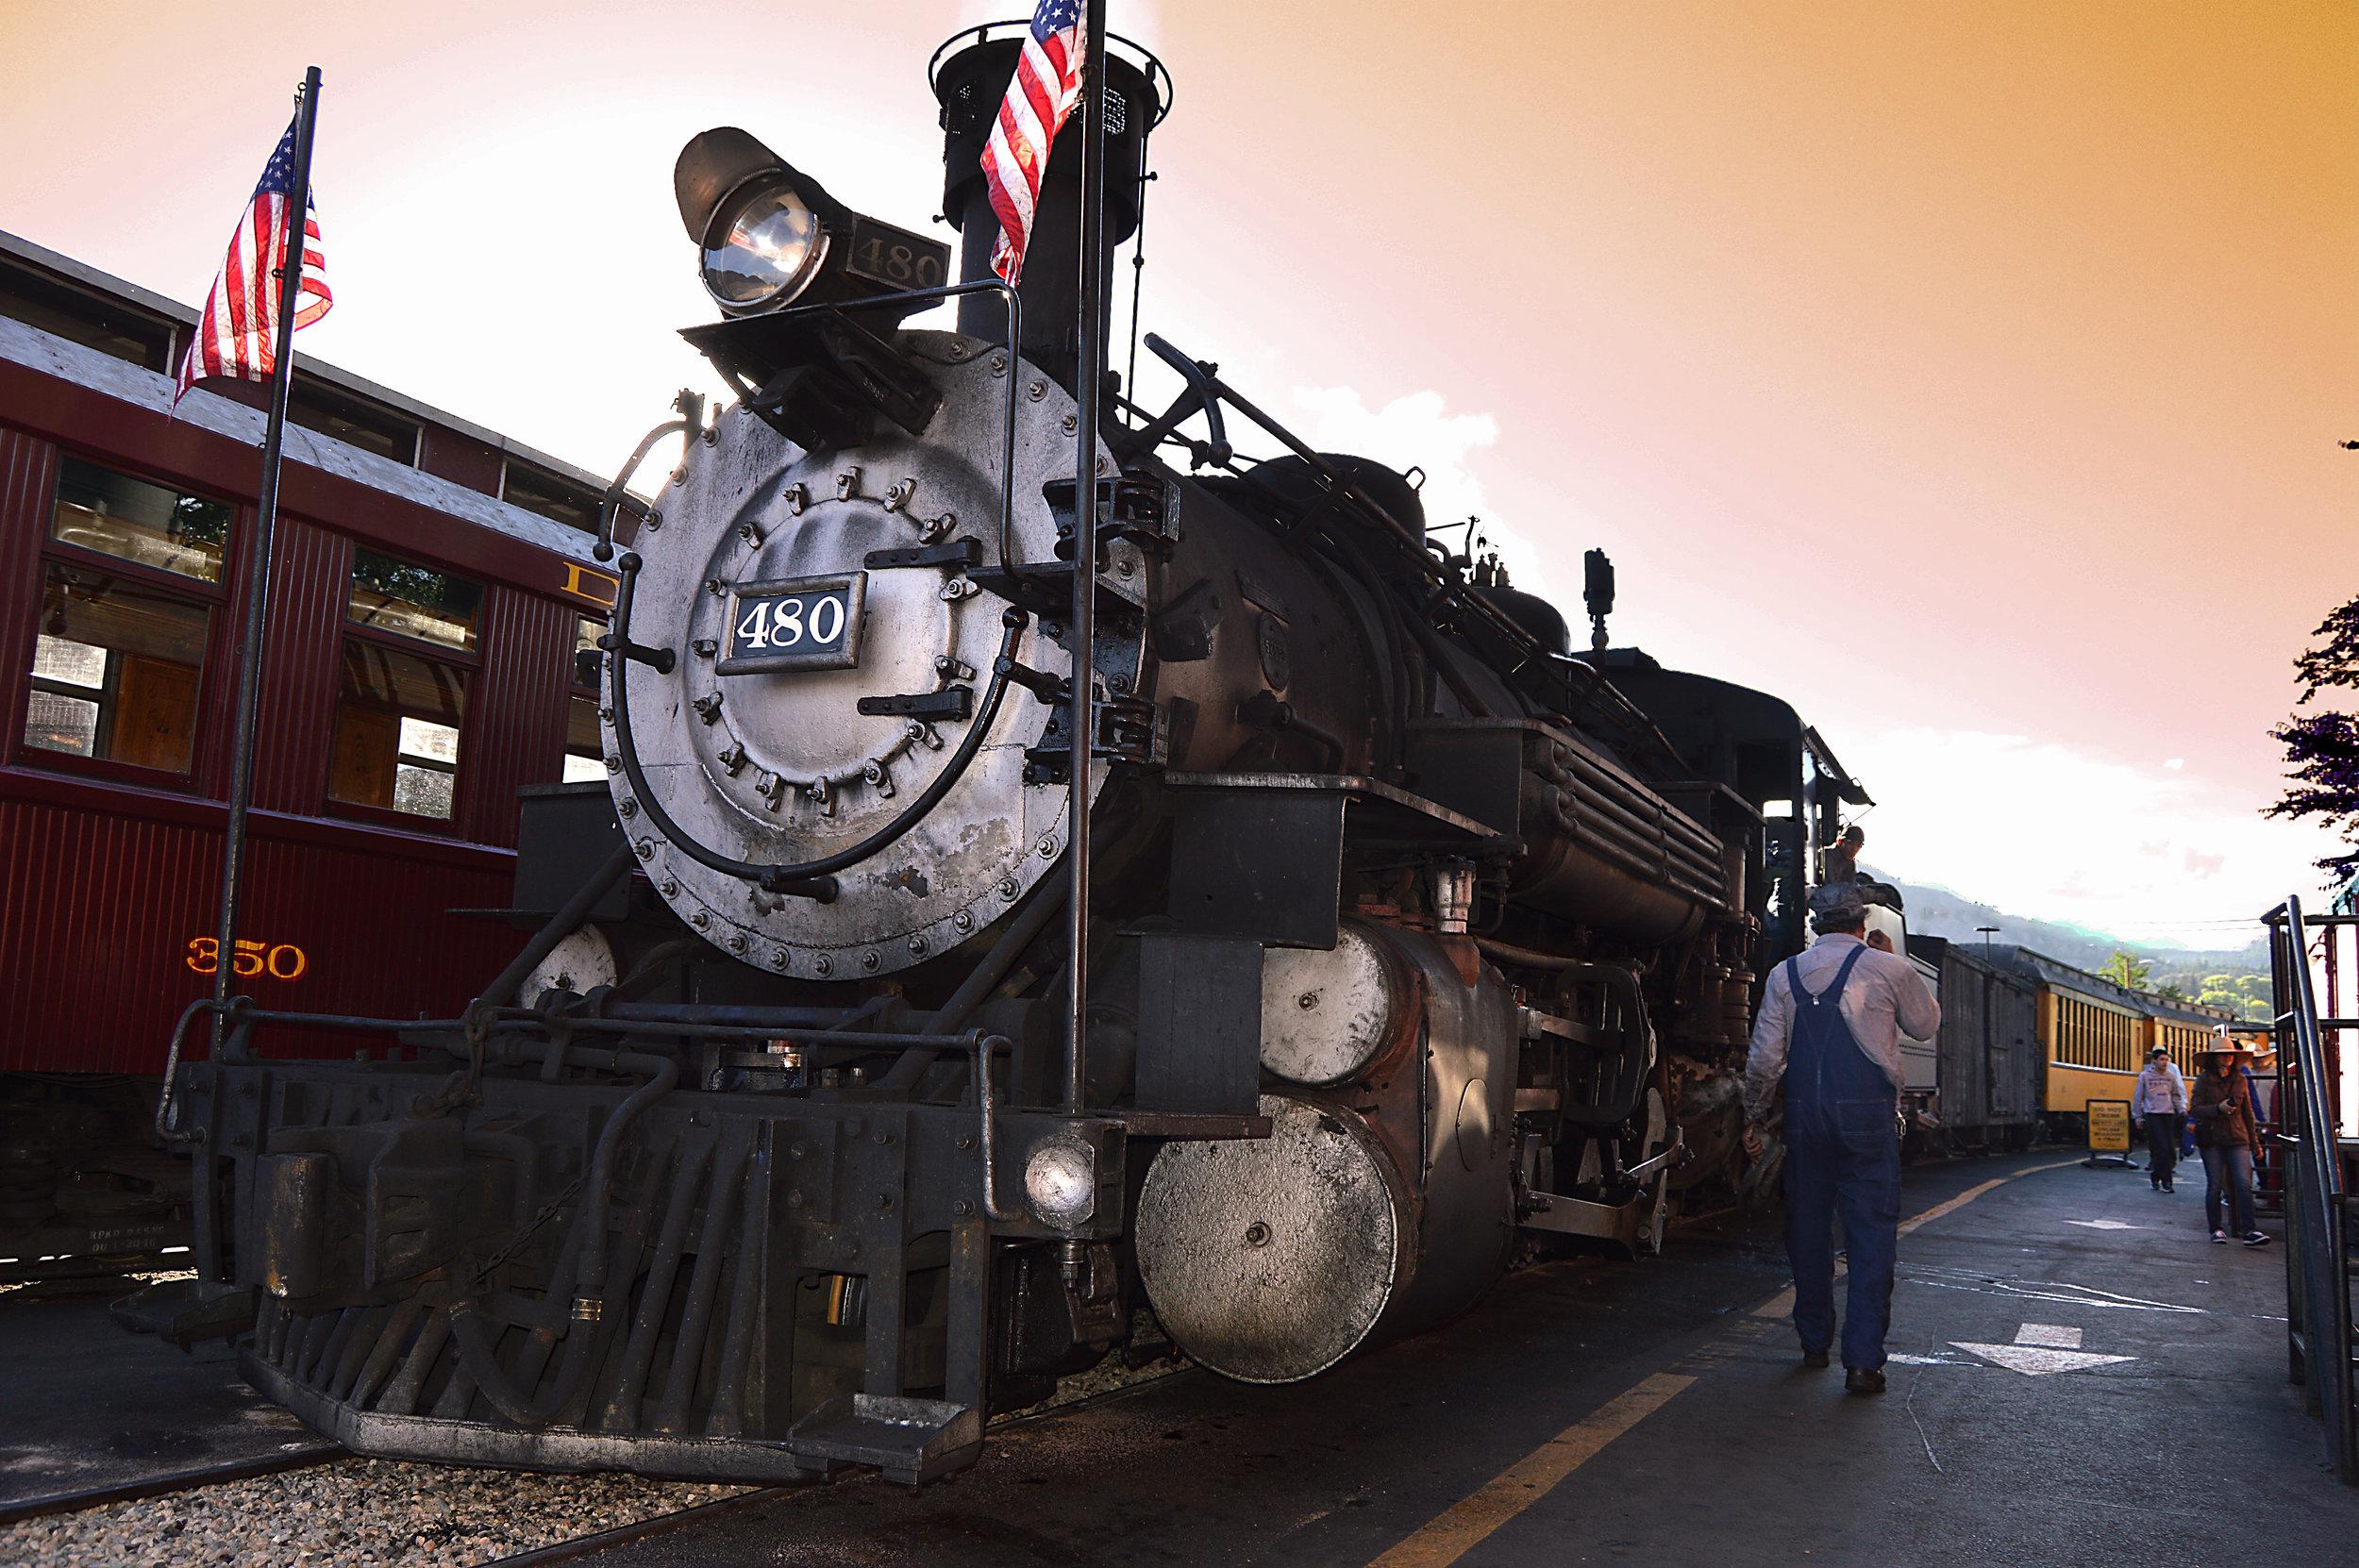 Colorado & New Mexico Rails - Sunday, June 28 - Sunday, July , 2020